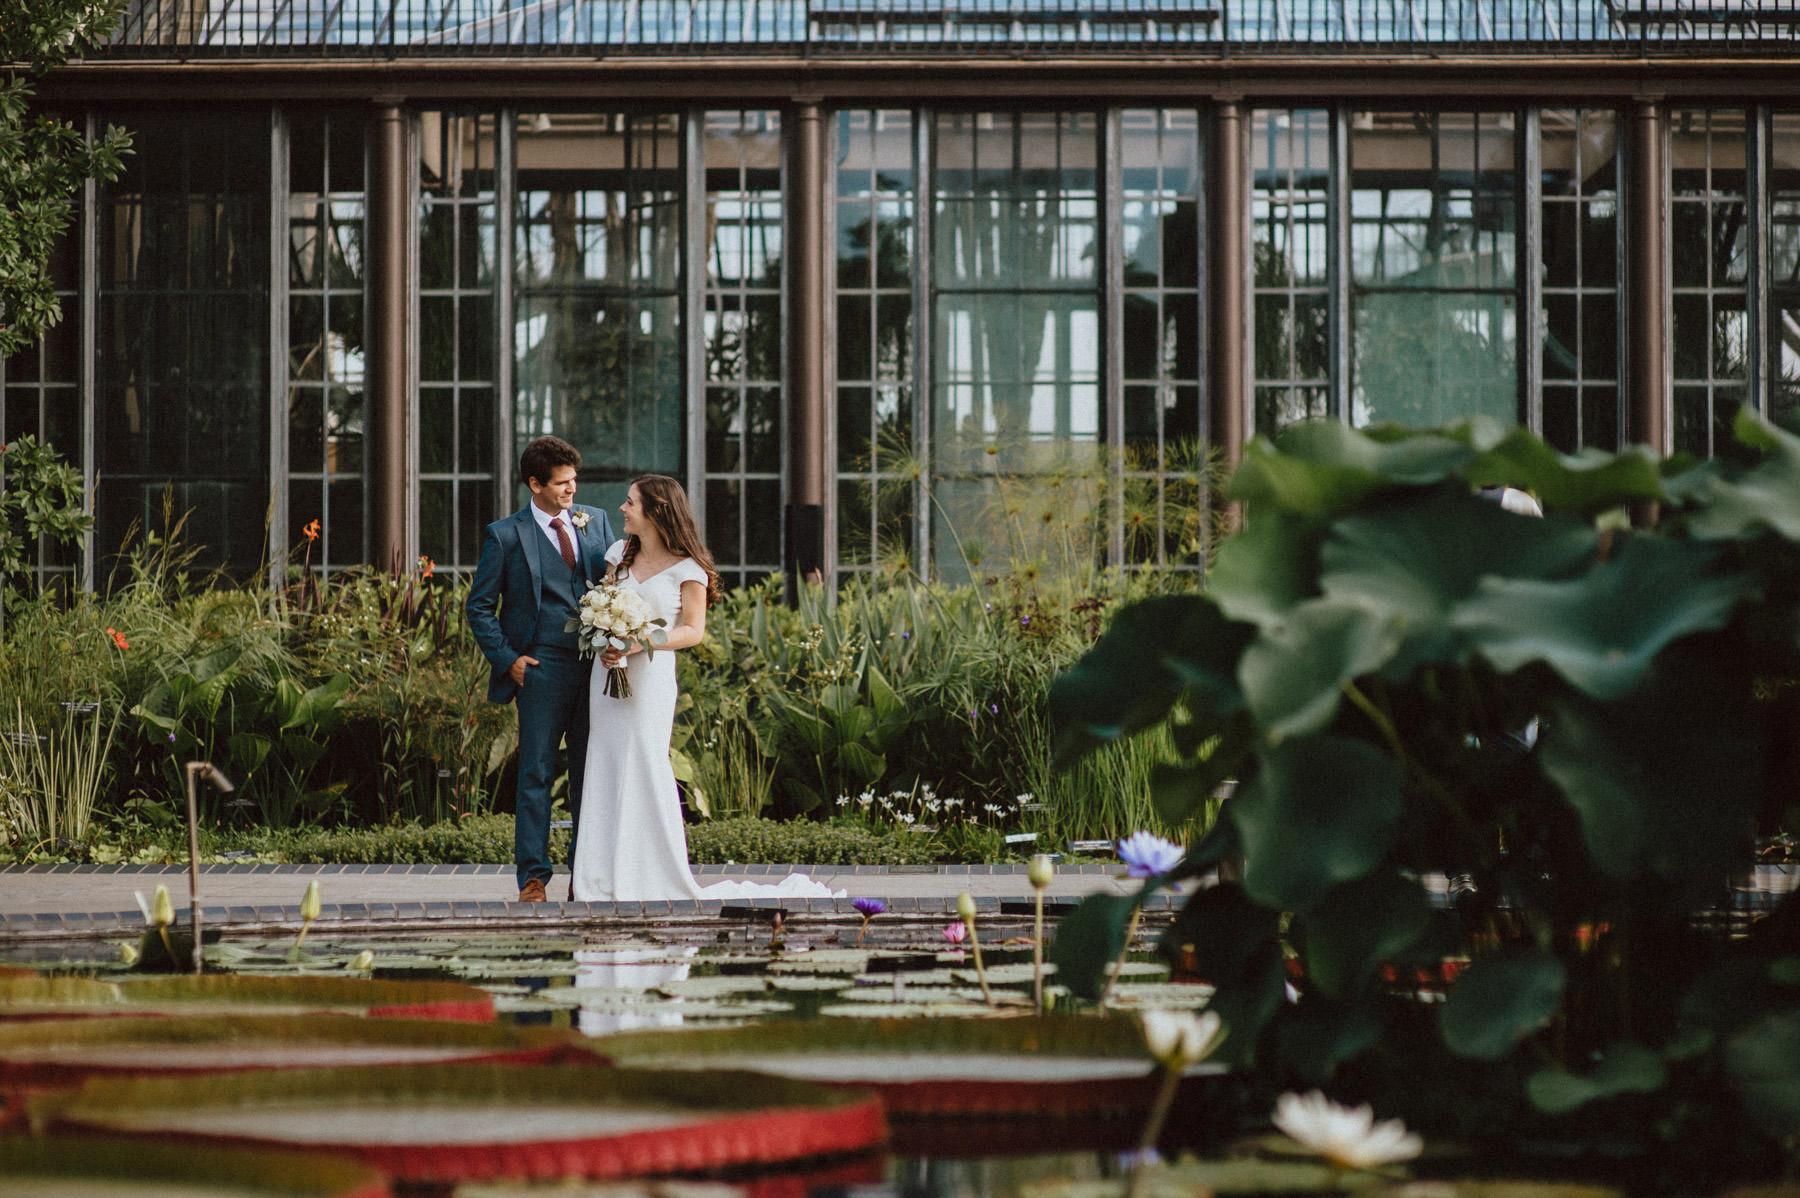 239-brandywine-river-museum-wedding-12.jpg